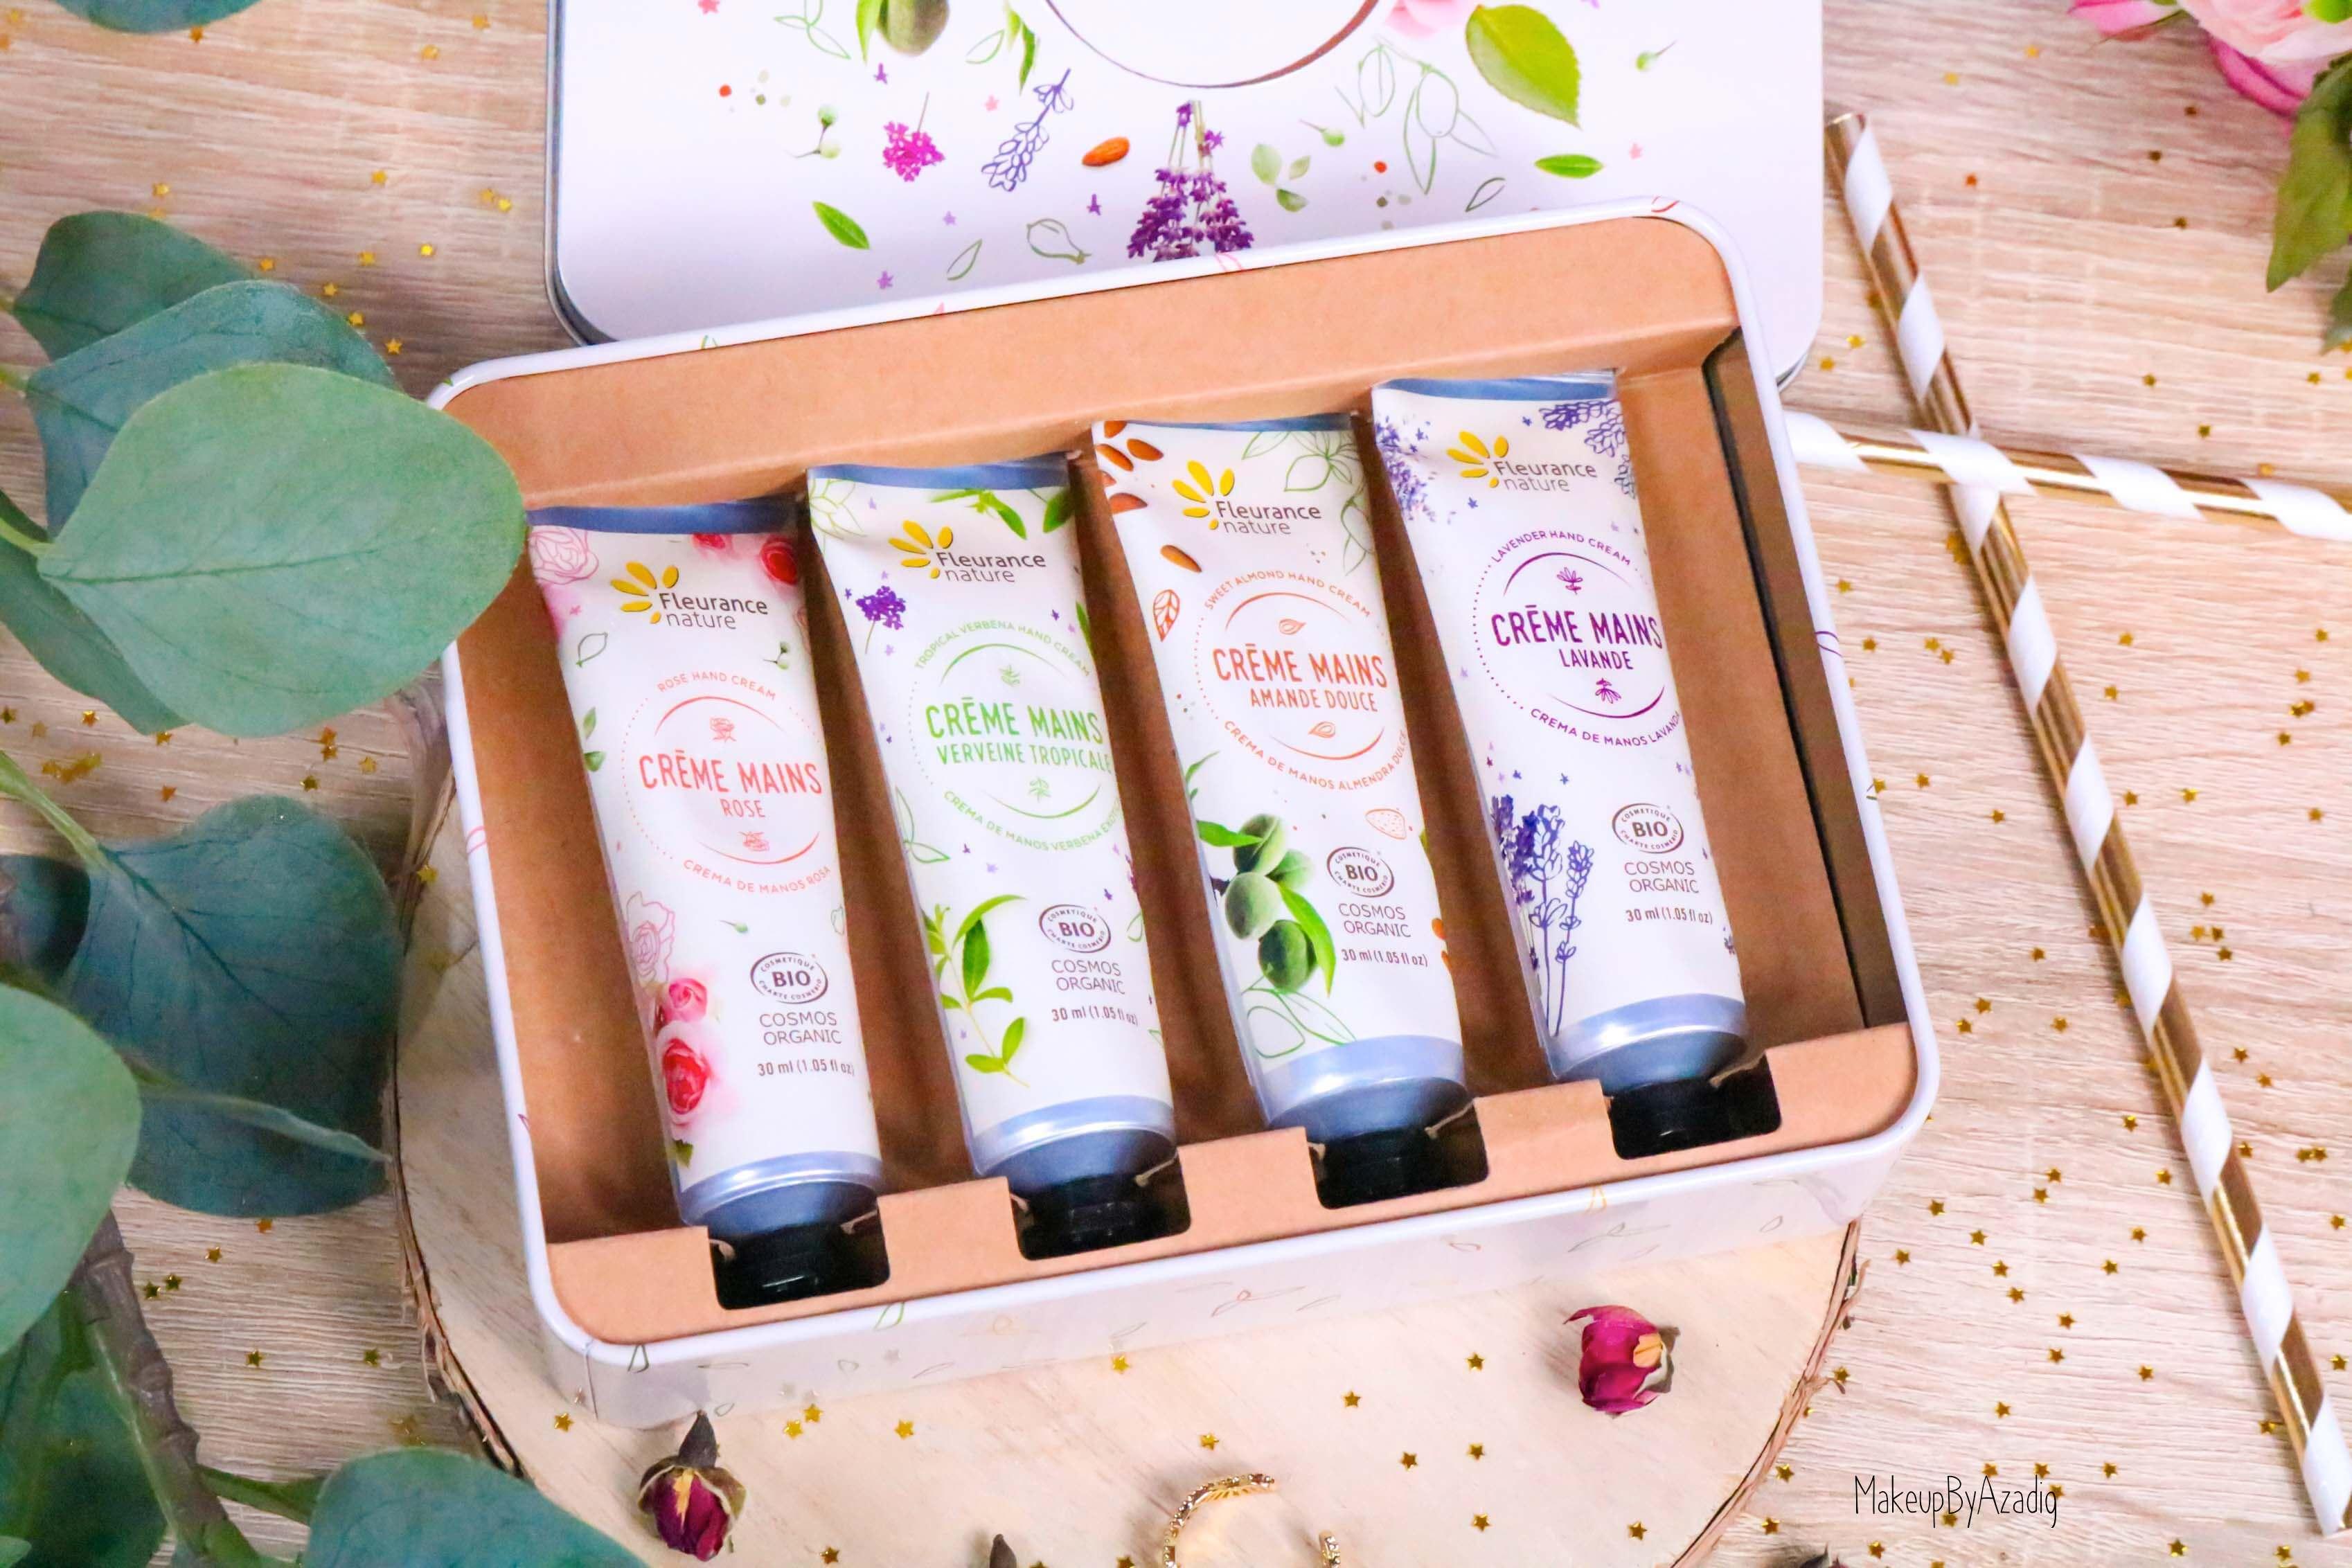 revue-creme-hydratante-reparatrice-mains-hand-bio-beaute-fleurance-nature-makeupbyazadig-verveine-lavande-rose-amande-organic